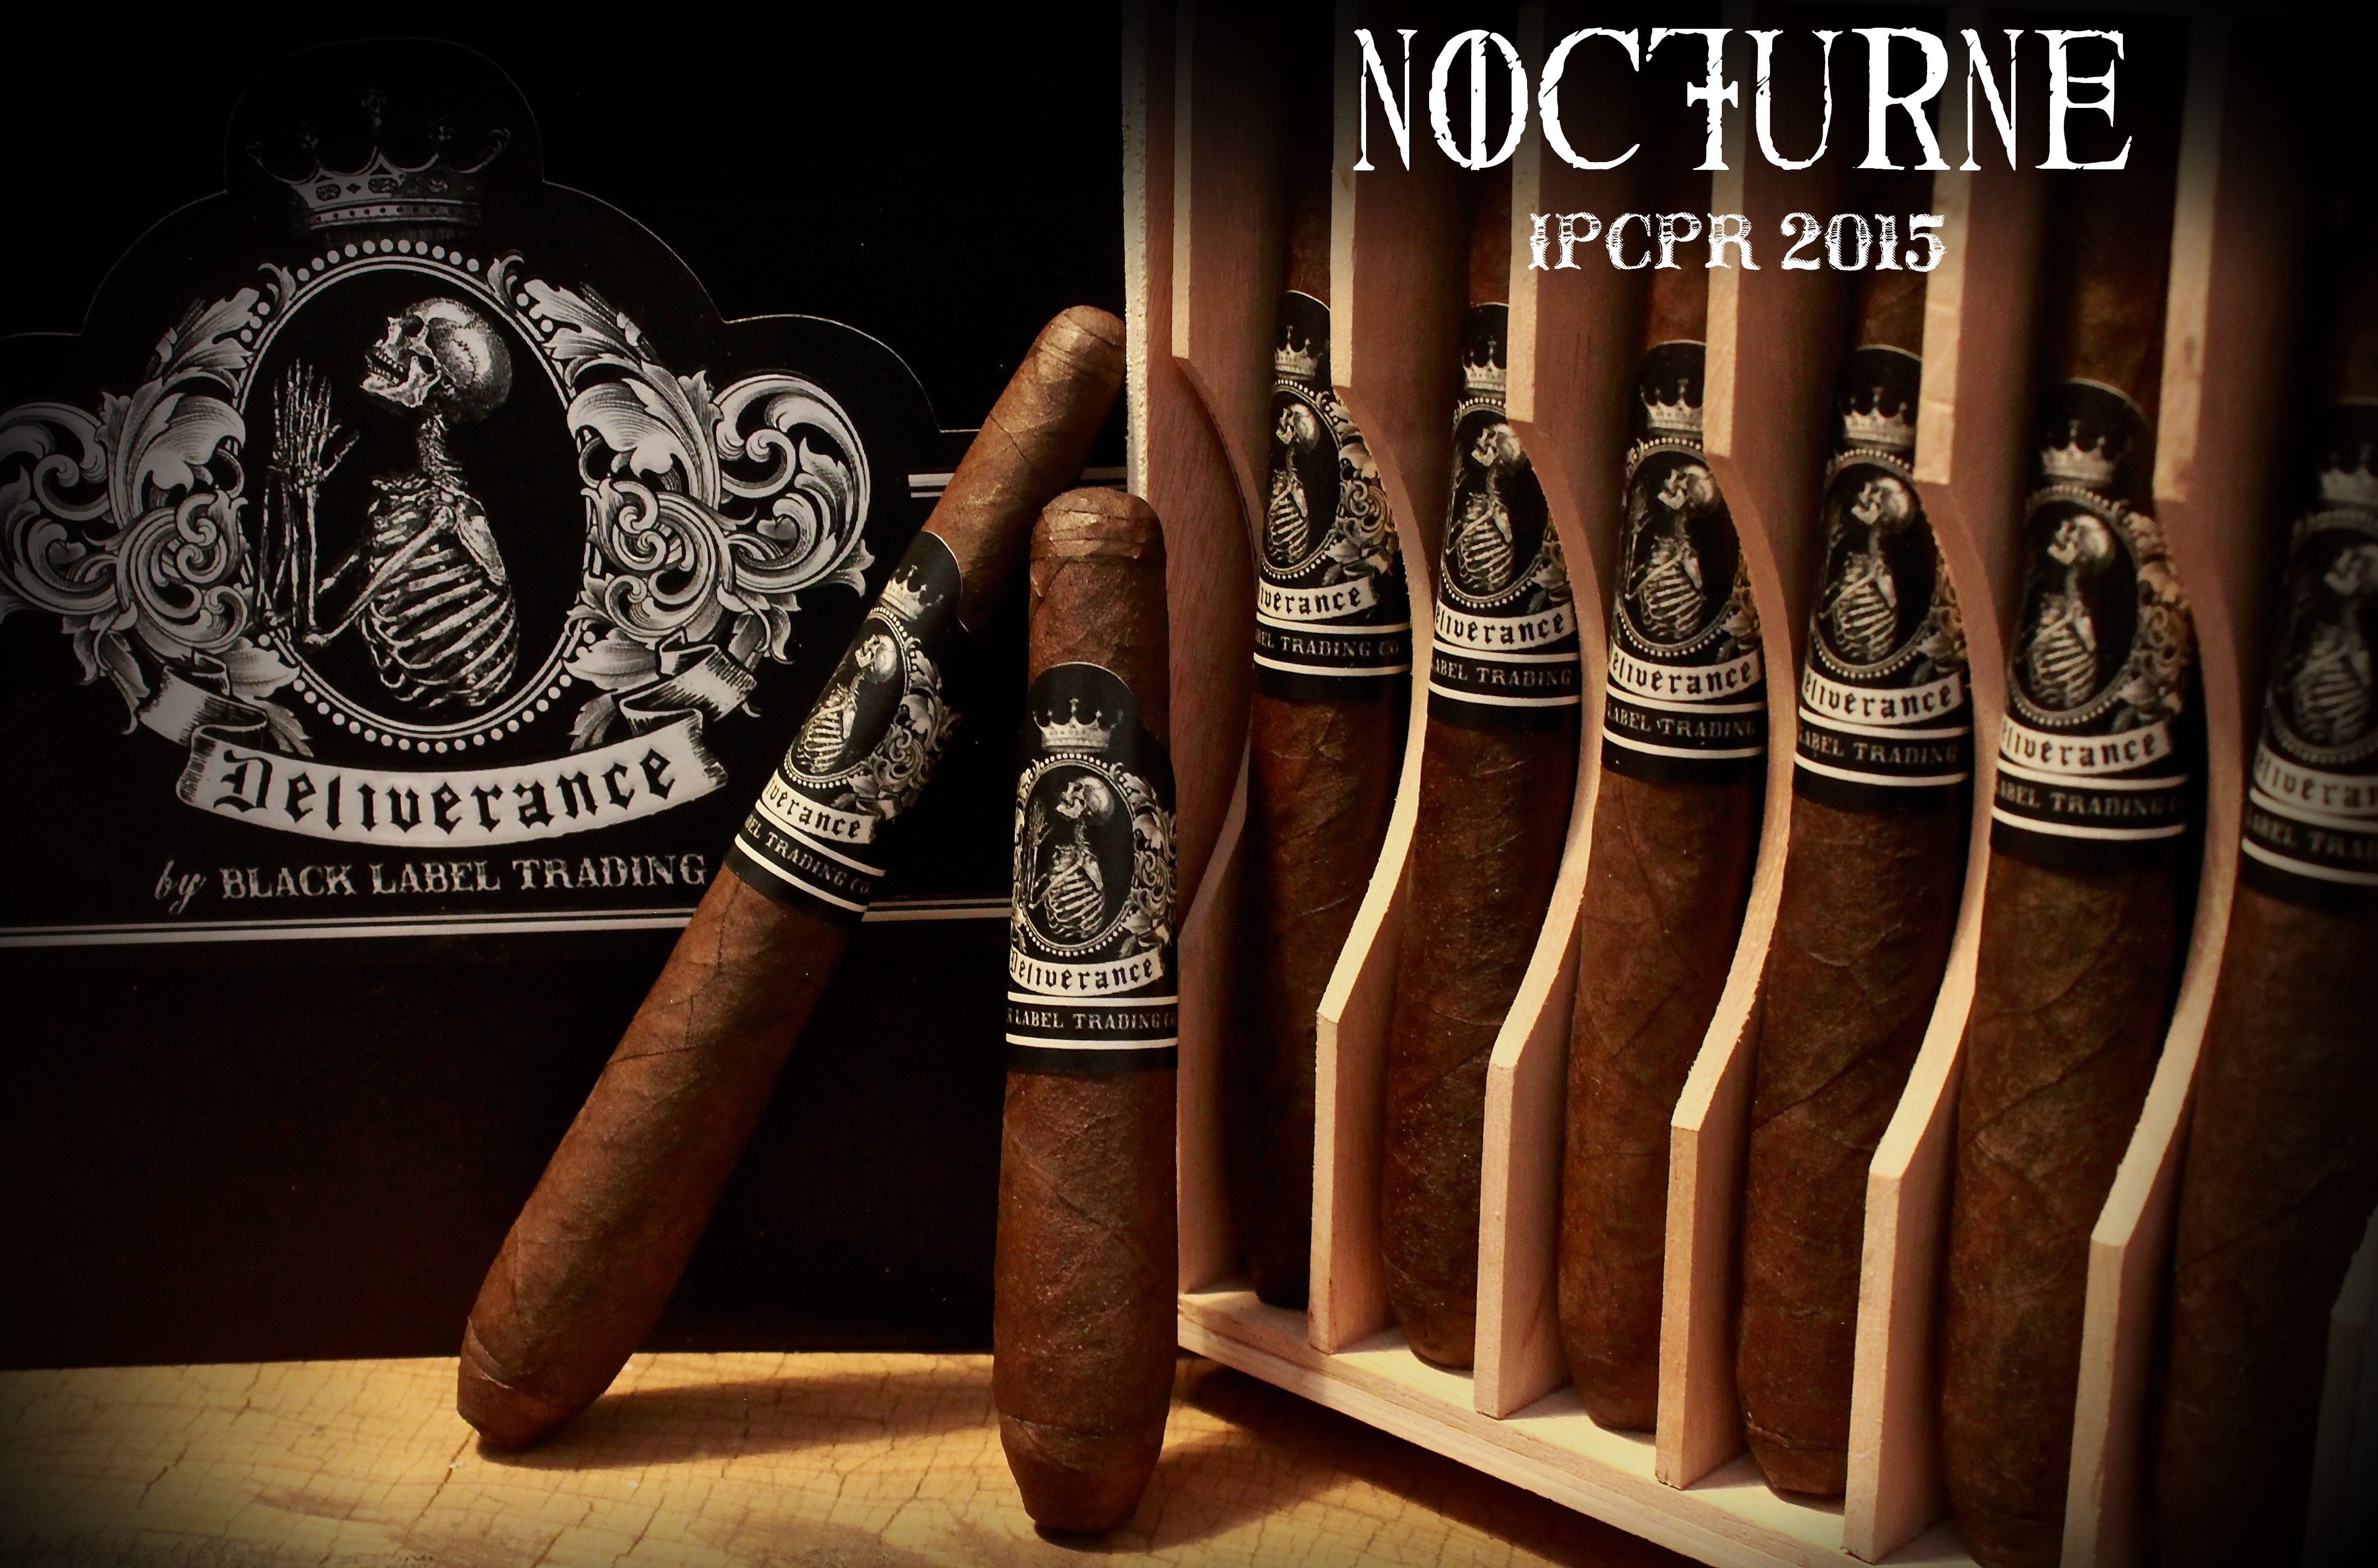 Black_Label_Trading_Company_Deliverance_Nocturne